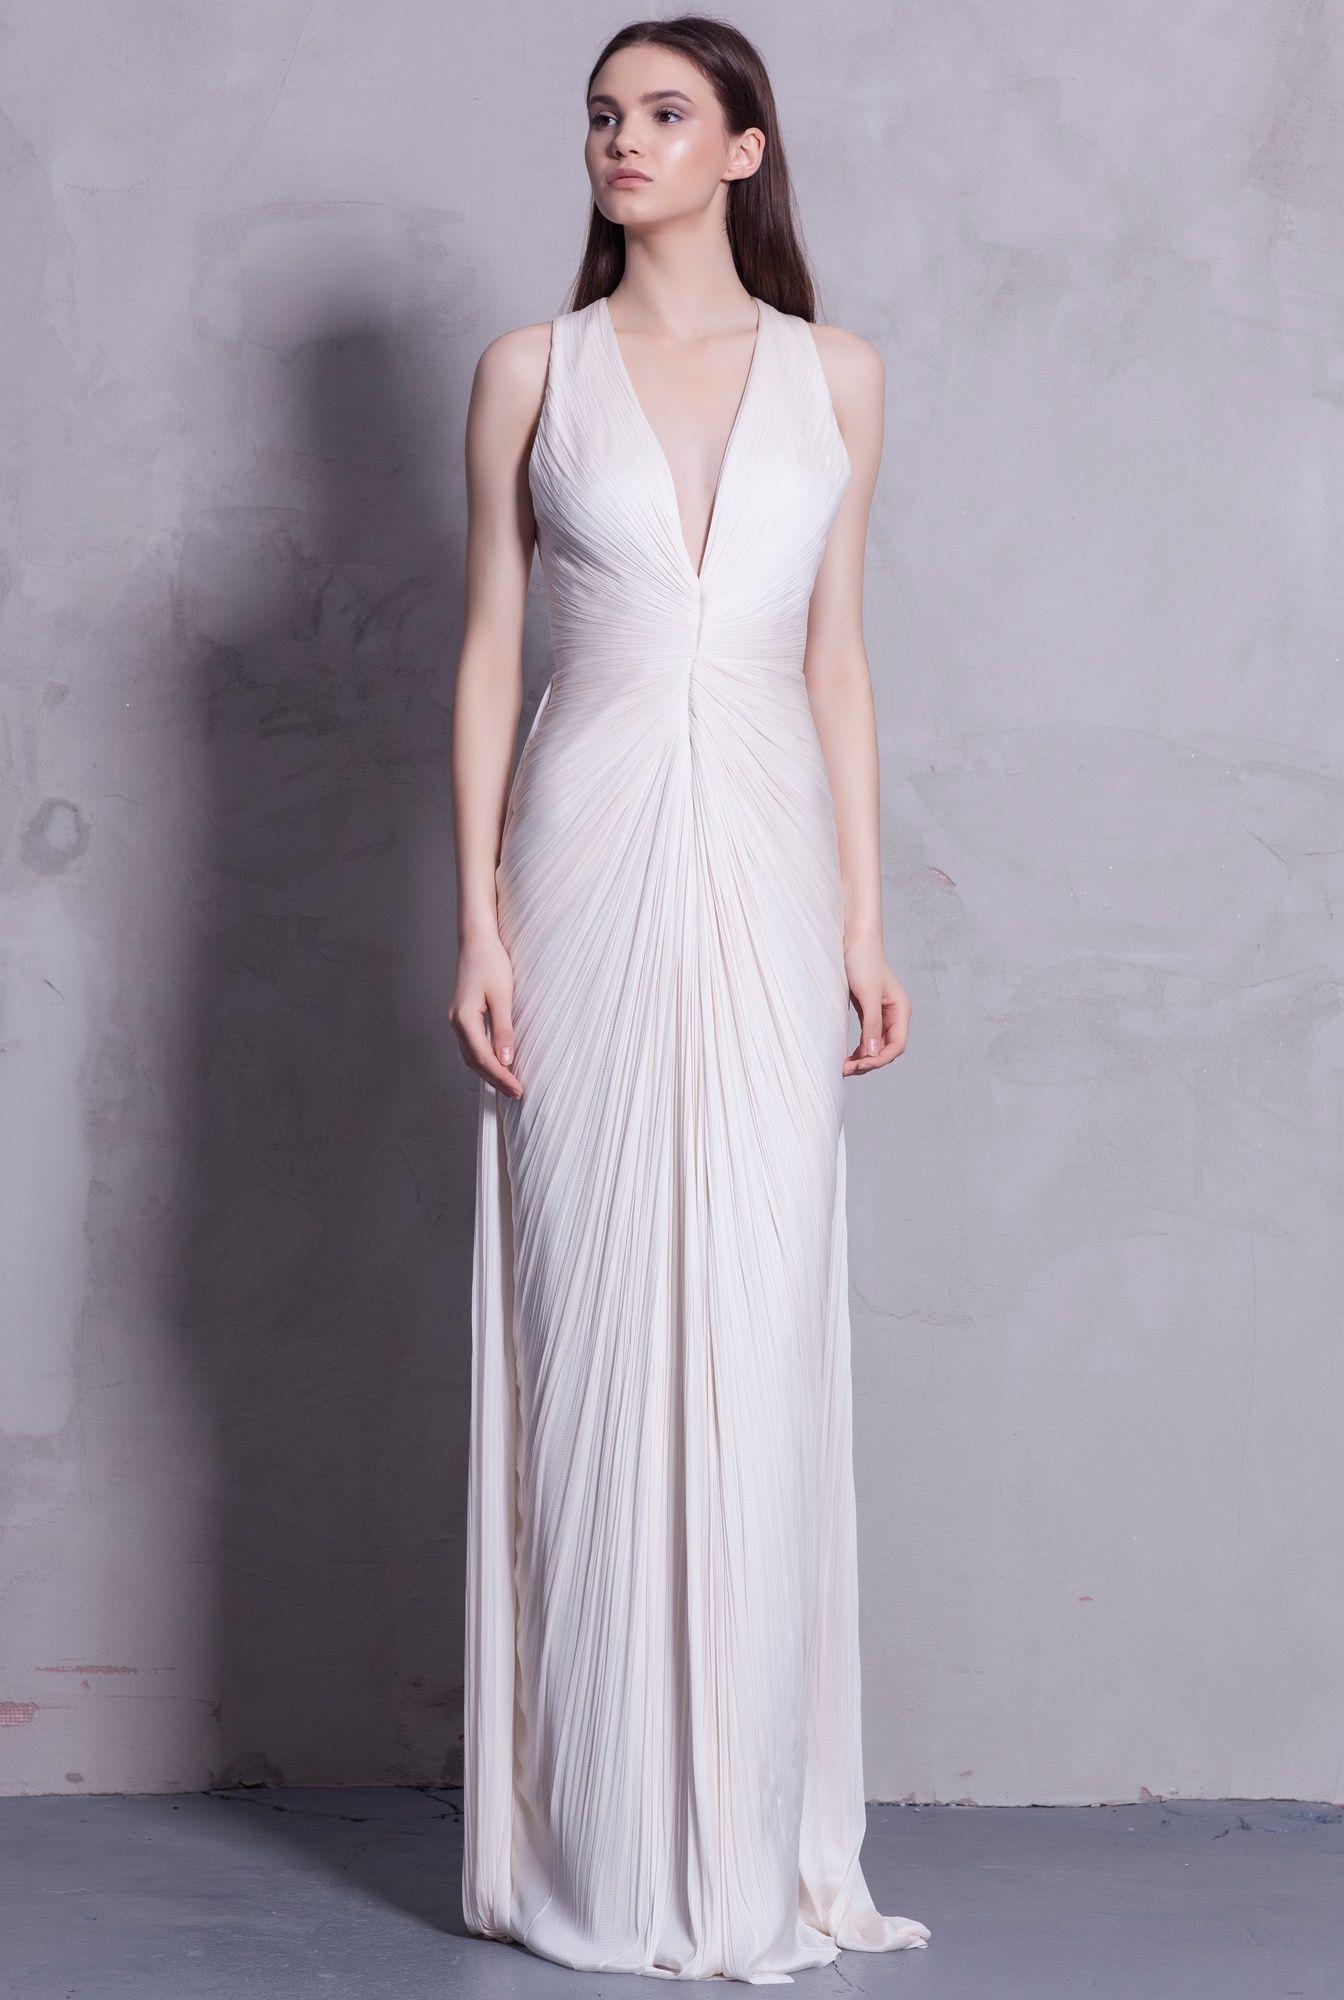 Click here to buy Maria Lucia Hohan ELIZ dress at MLHSHOPCOM